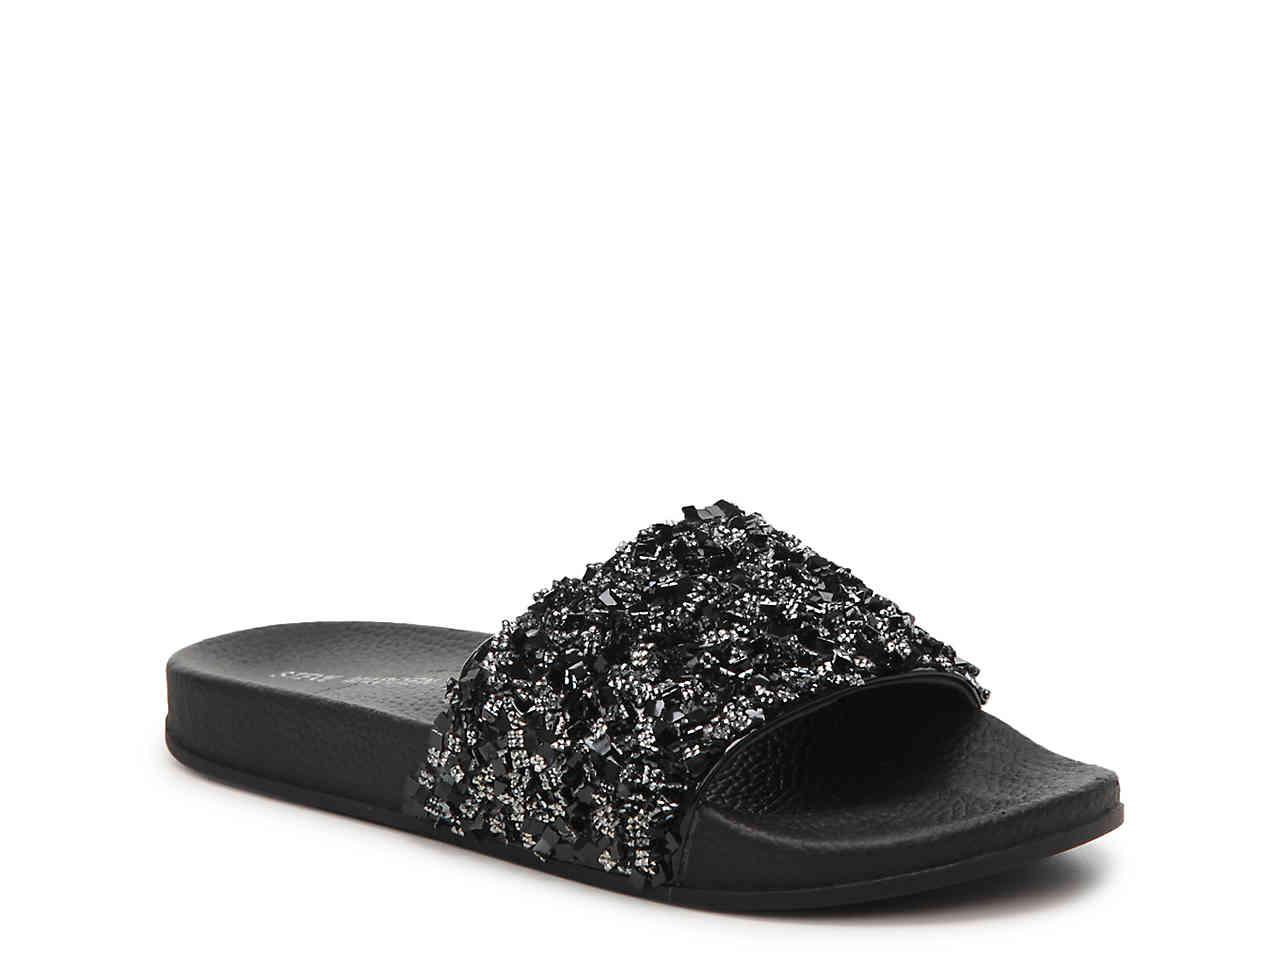 fd89693bfad Steve Madden Black Cady Slide Sandal